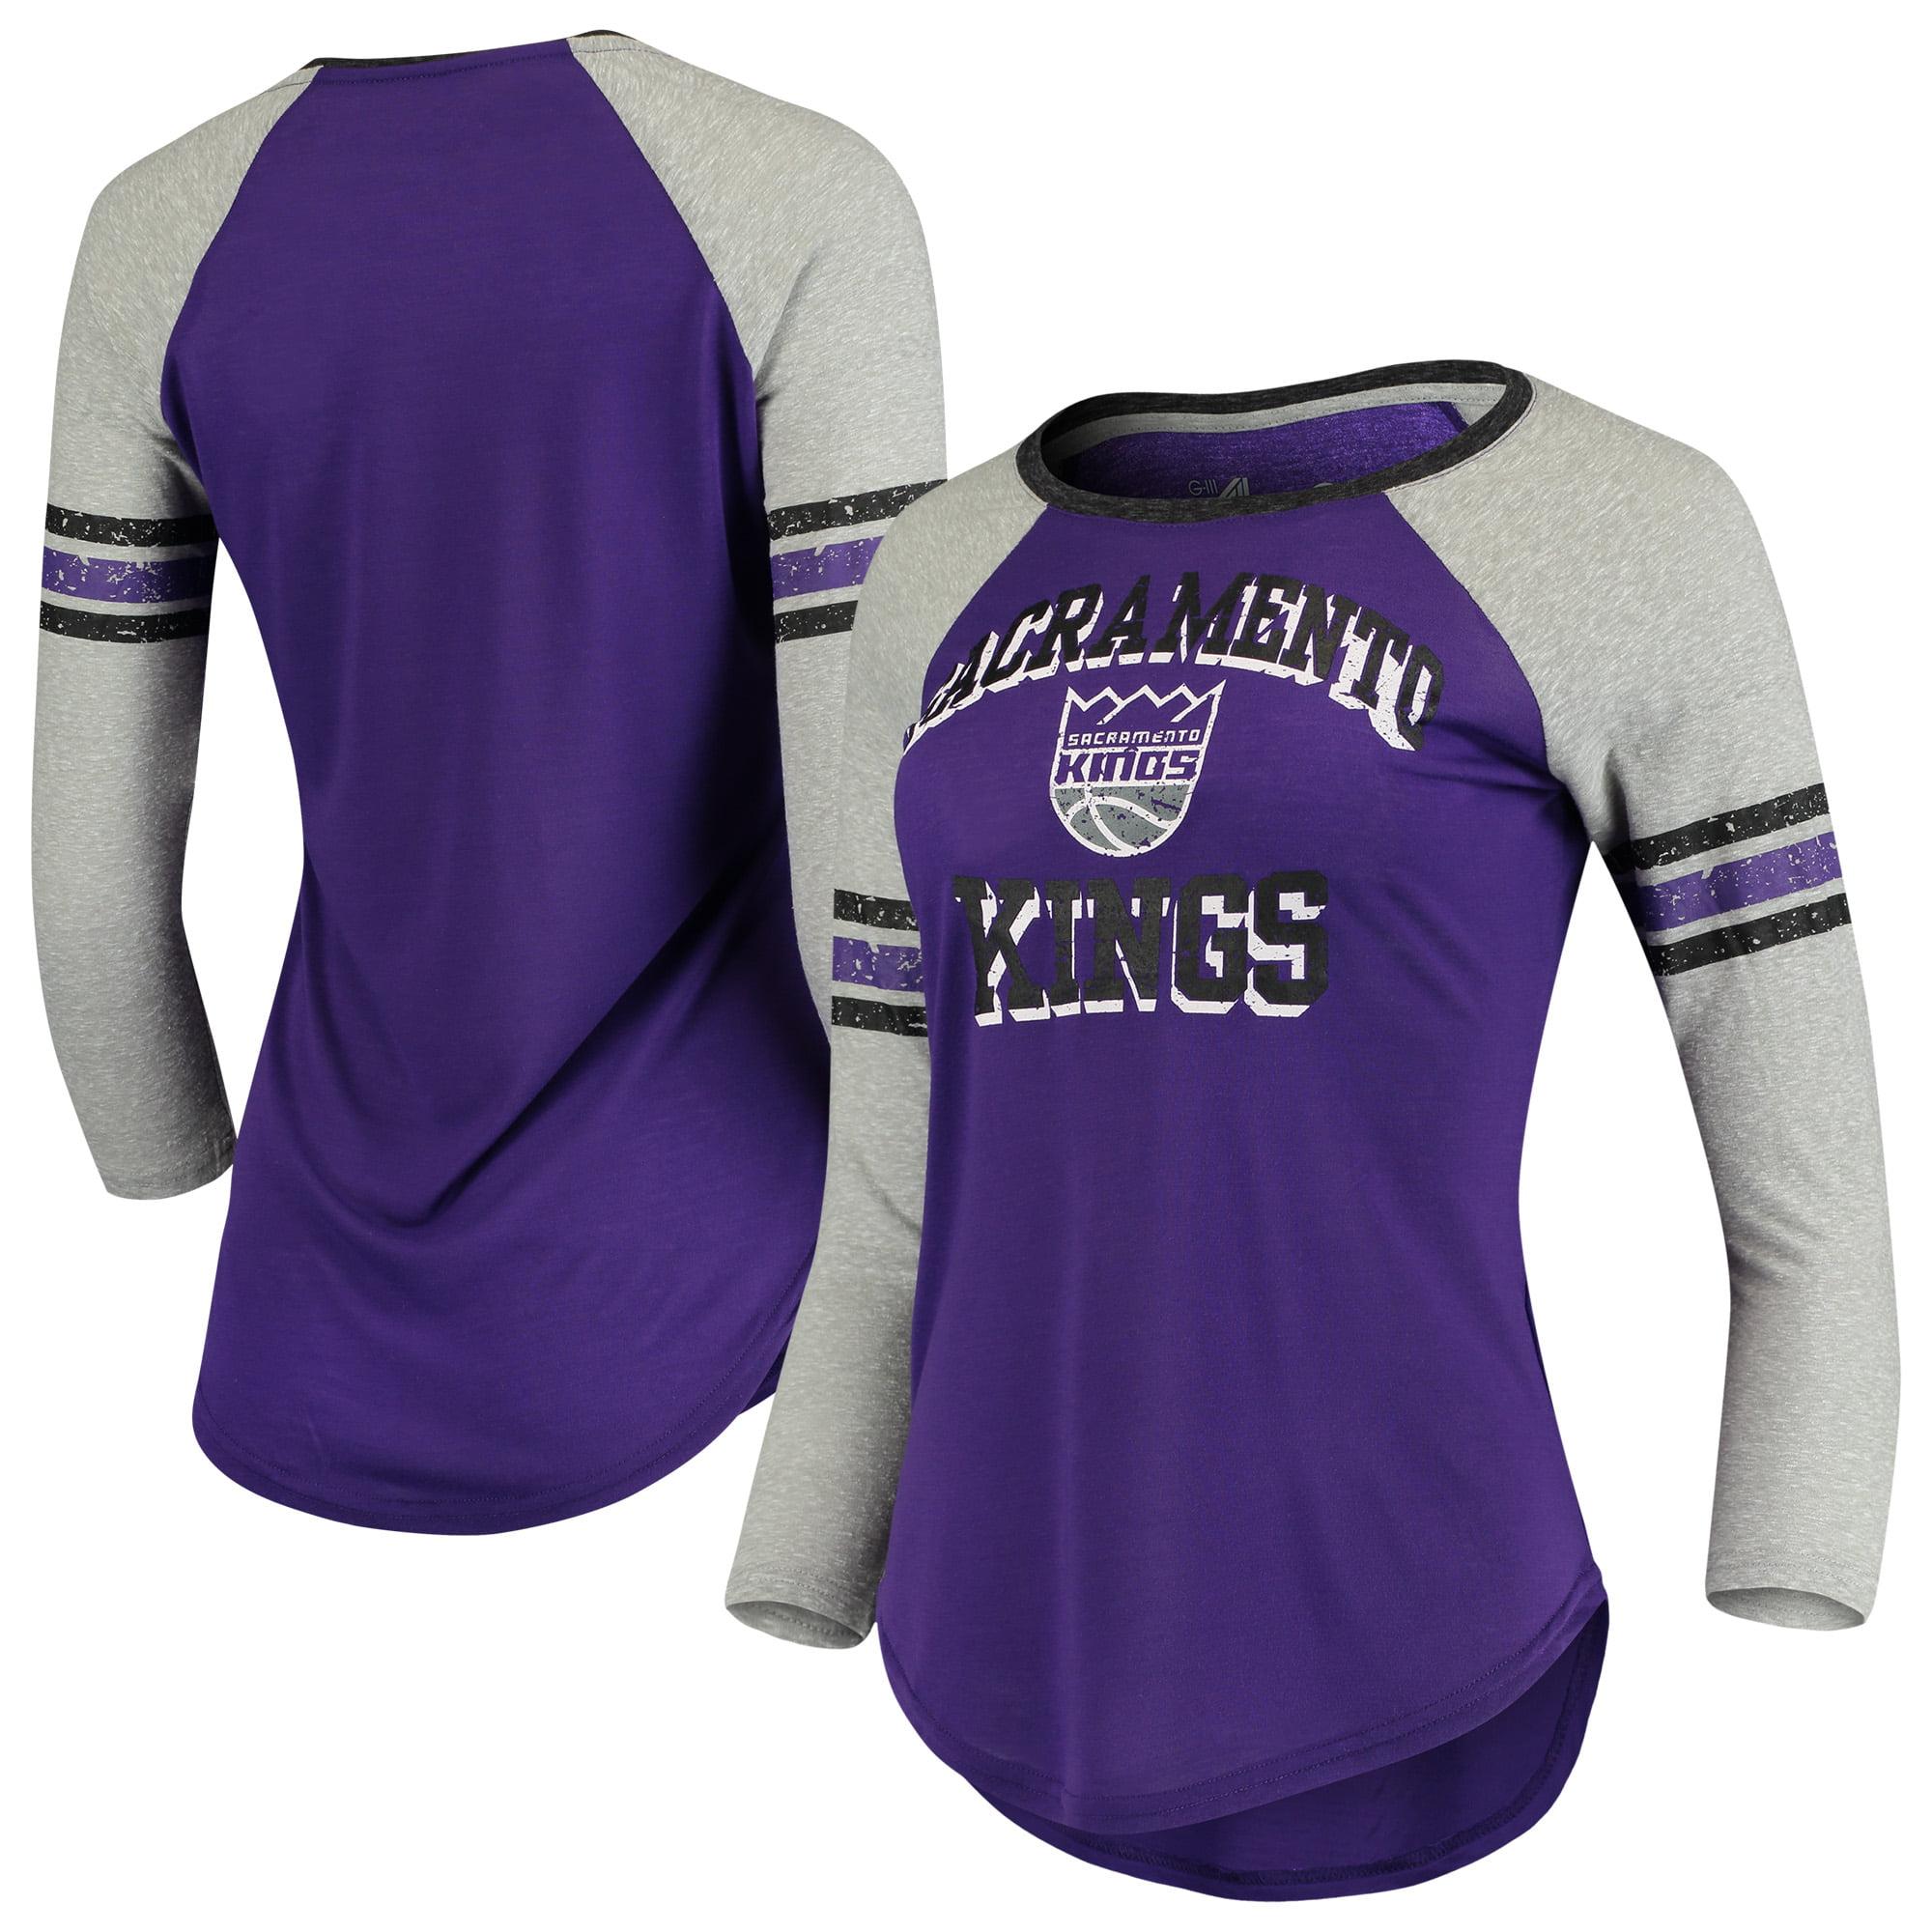 Sacramento Kings G-III 4Her by Carl Banks Women's The Court Tri-Blend Raglan 3/4-Sleeve T-Shirt - Purple/Heathered Gray